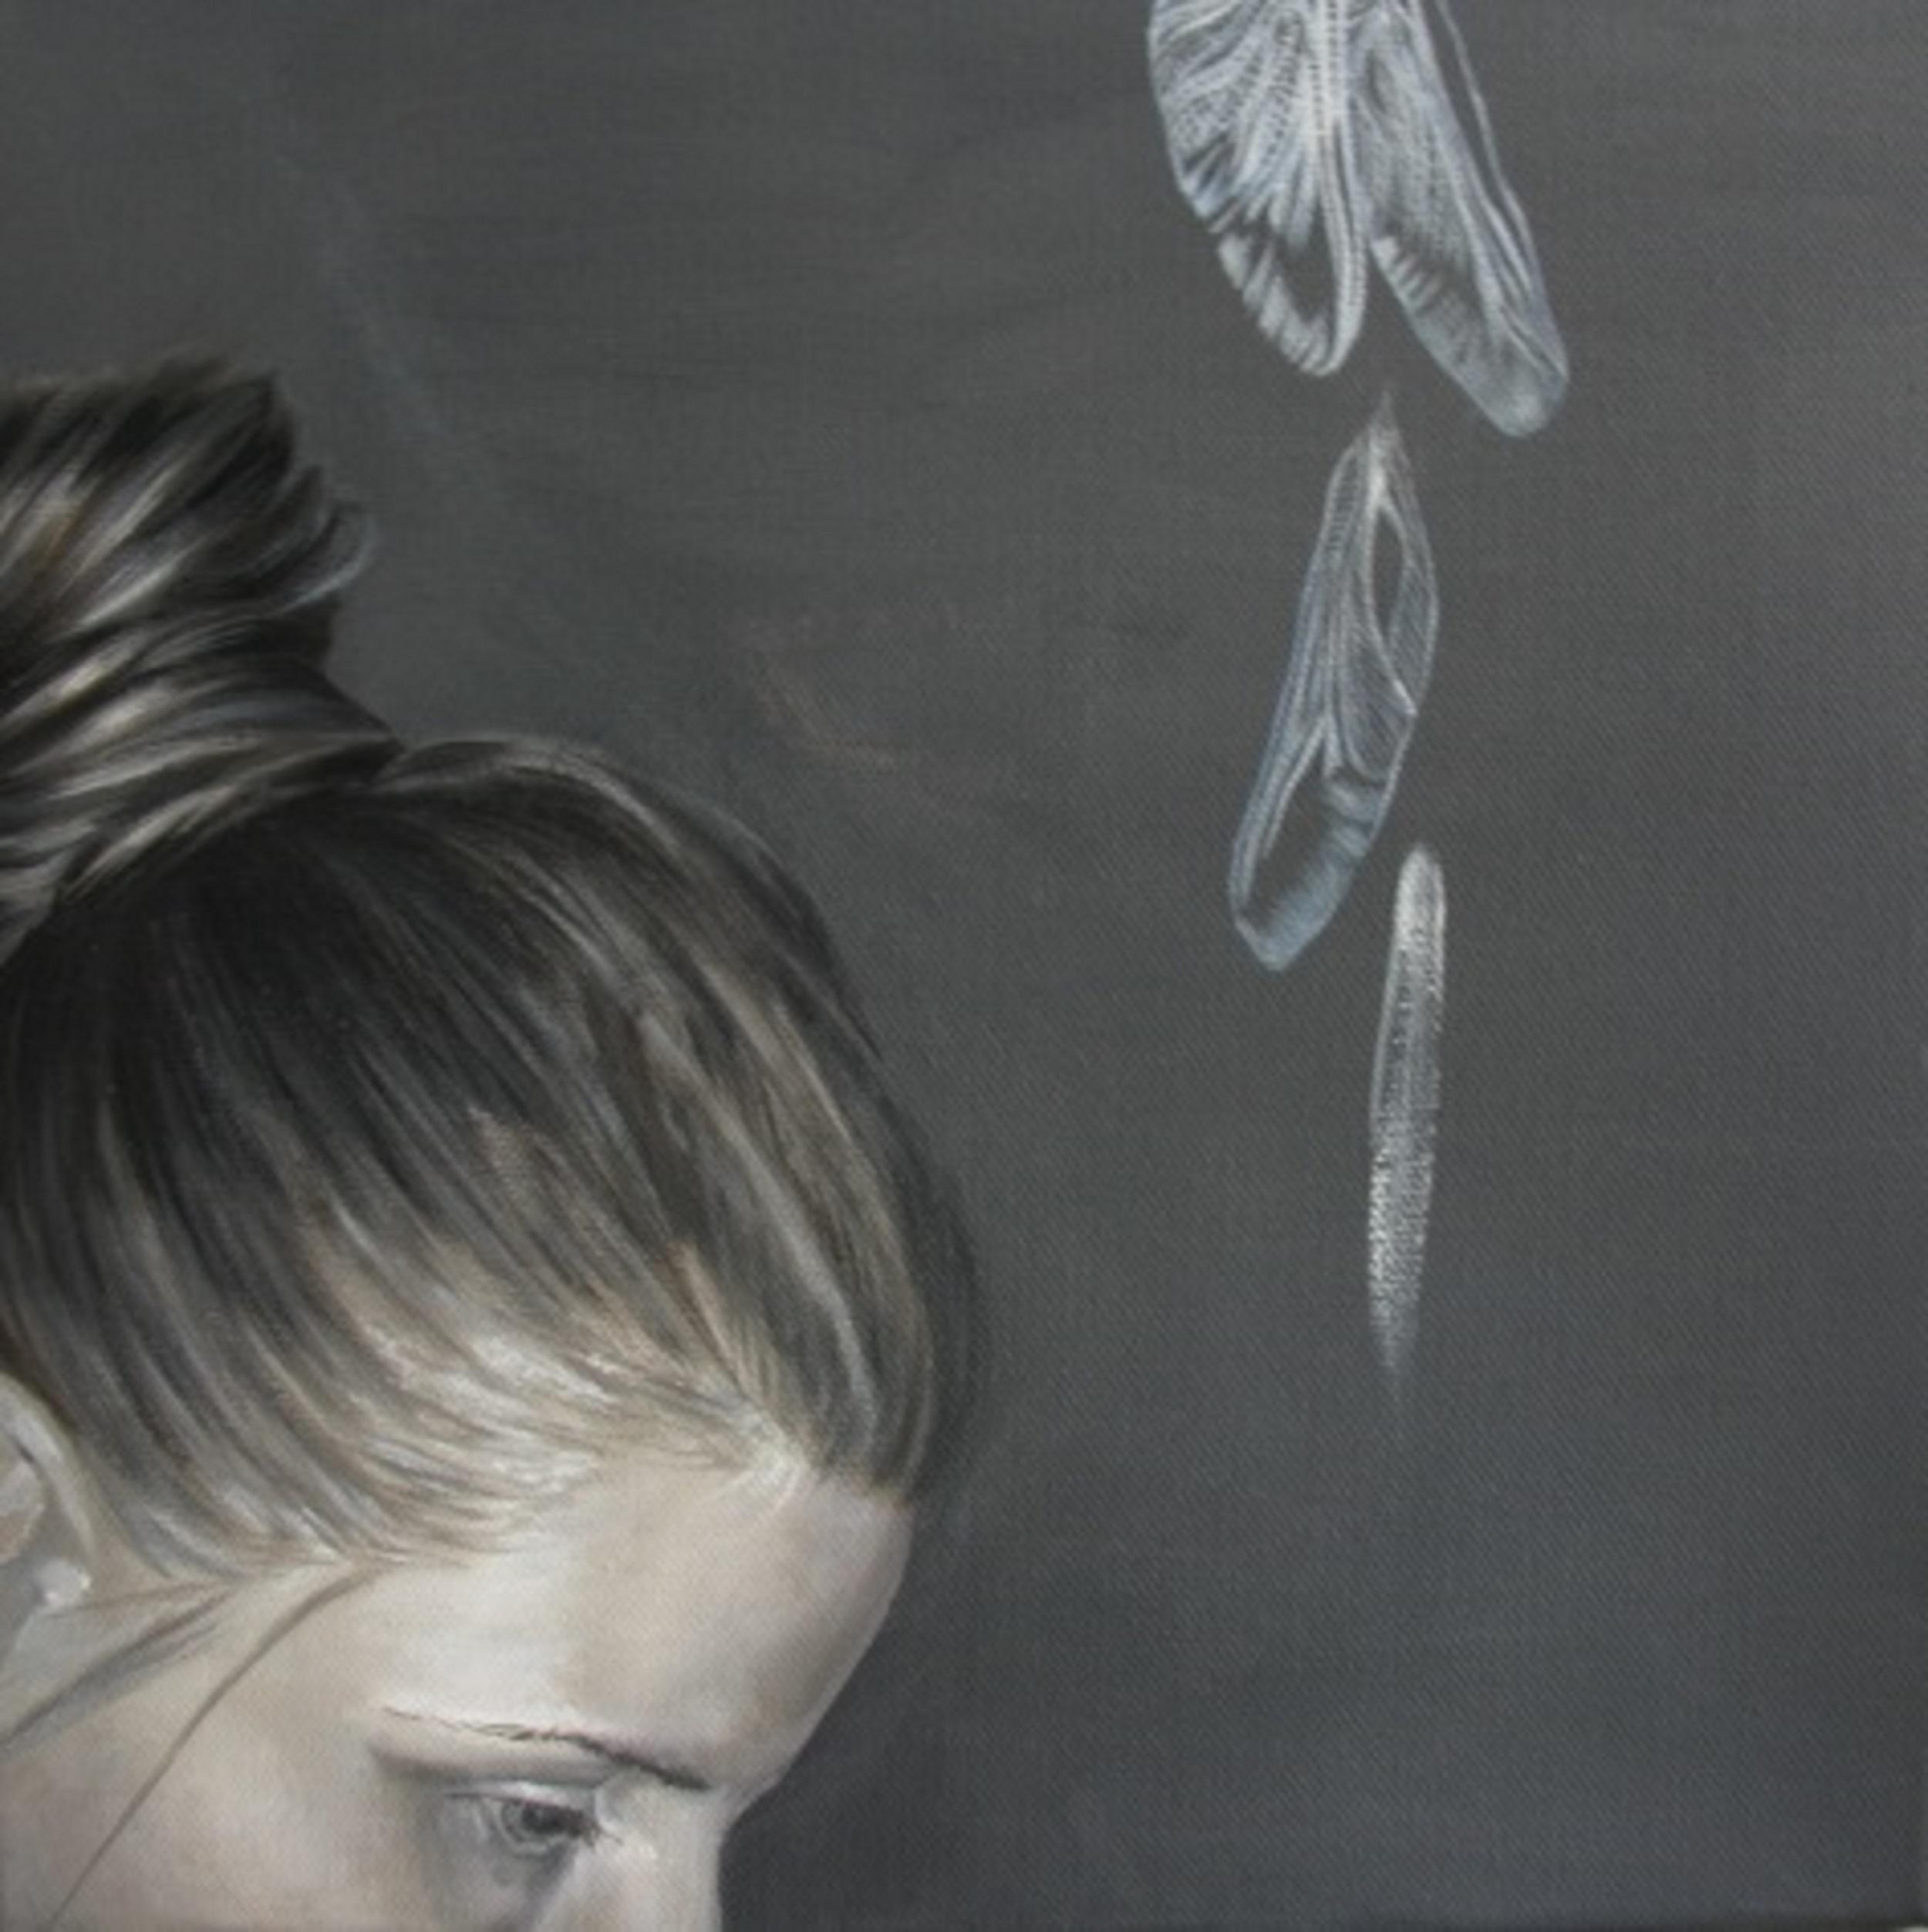 Riitta Kuisma, Self Portrait, Oil on Canvas